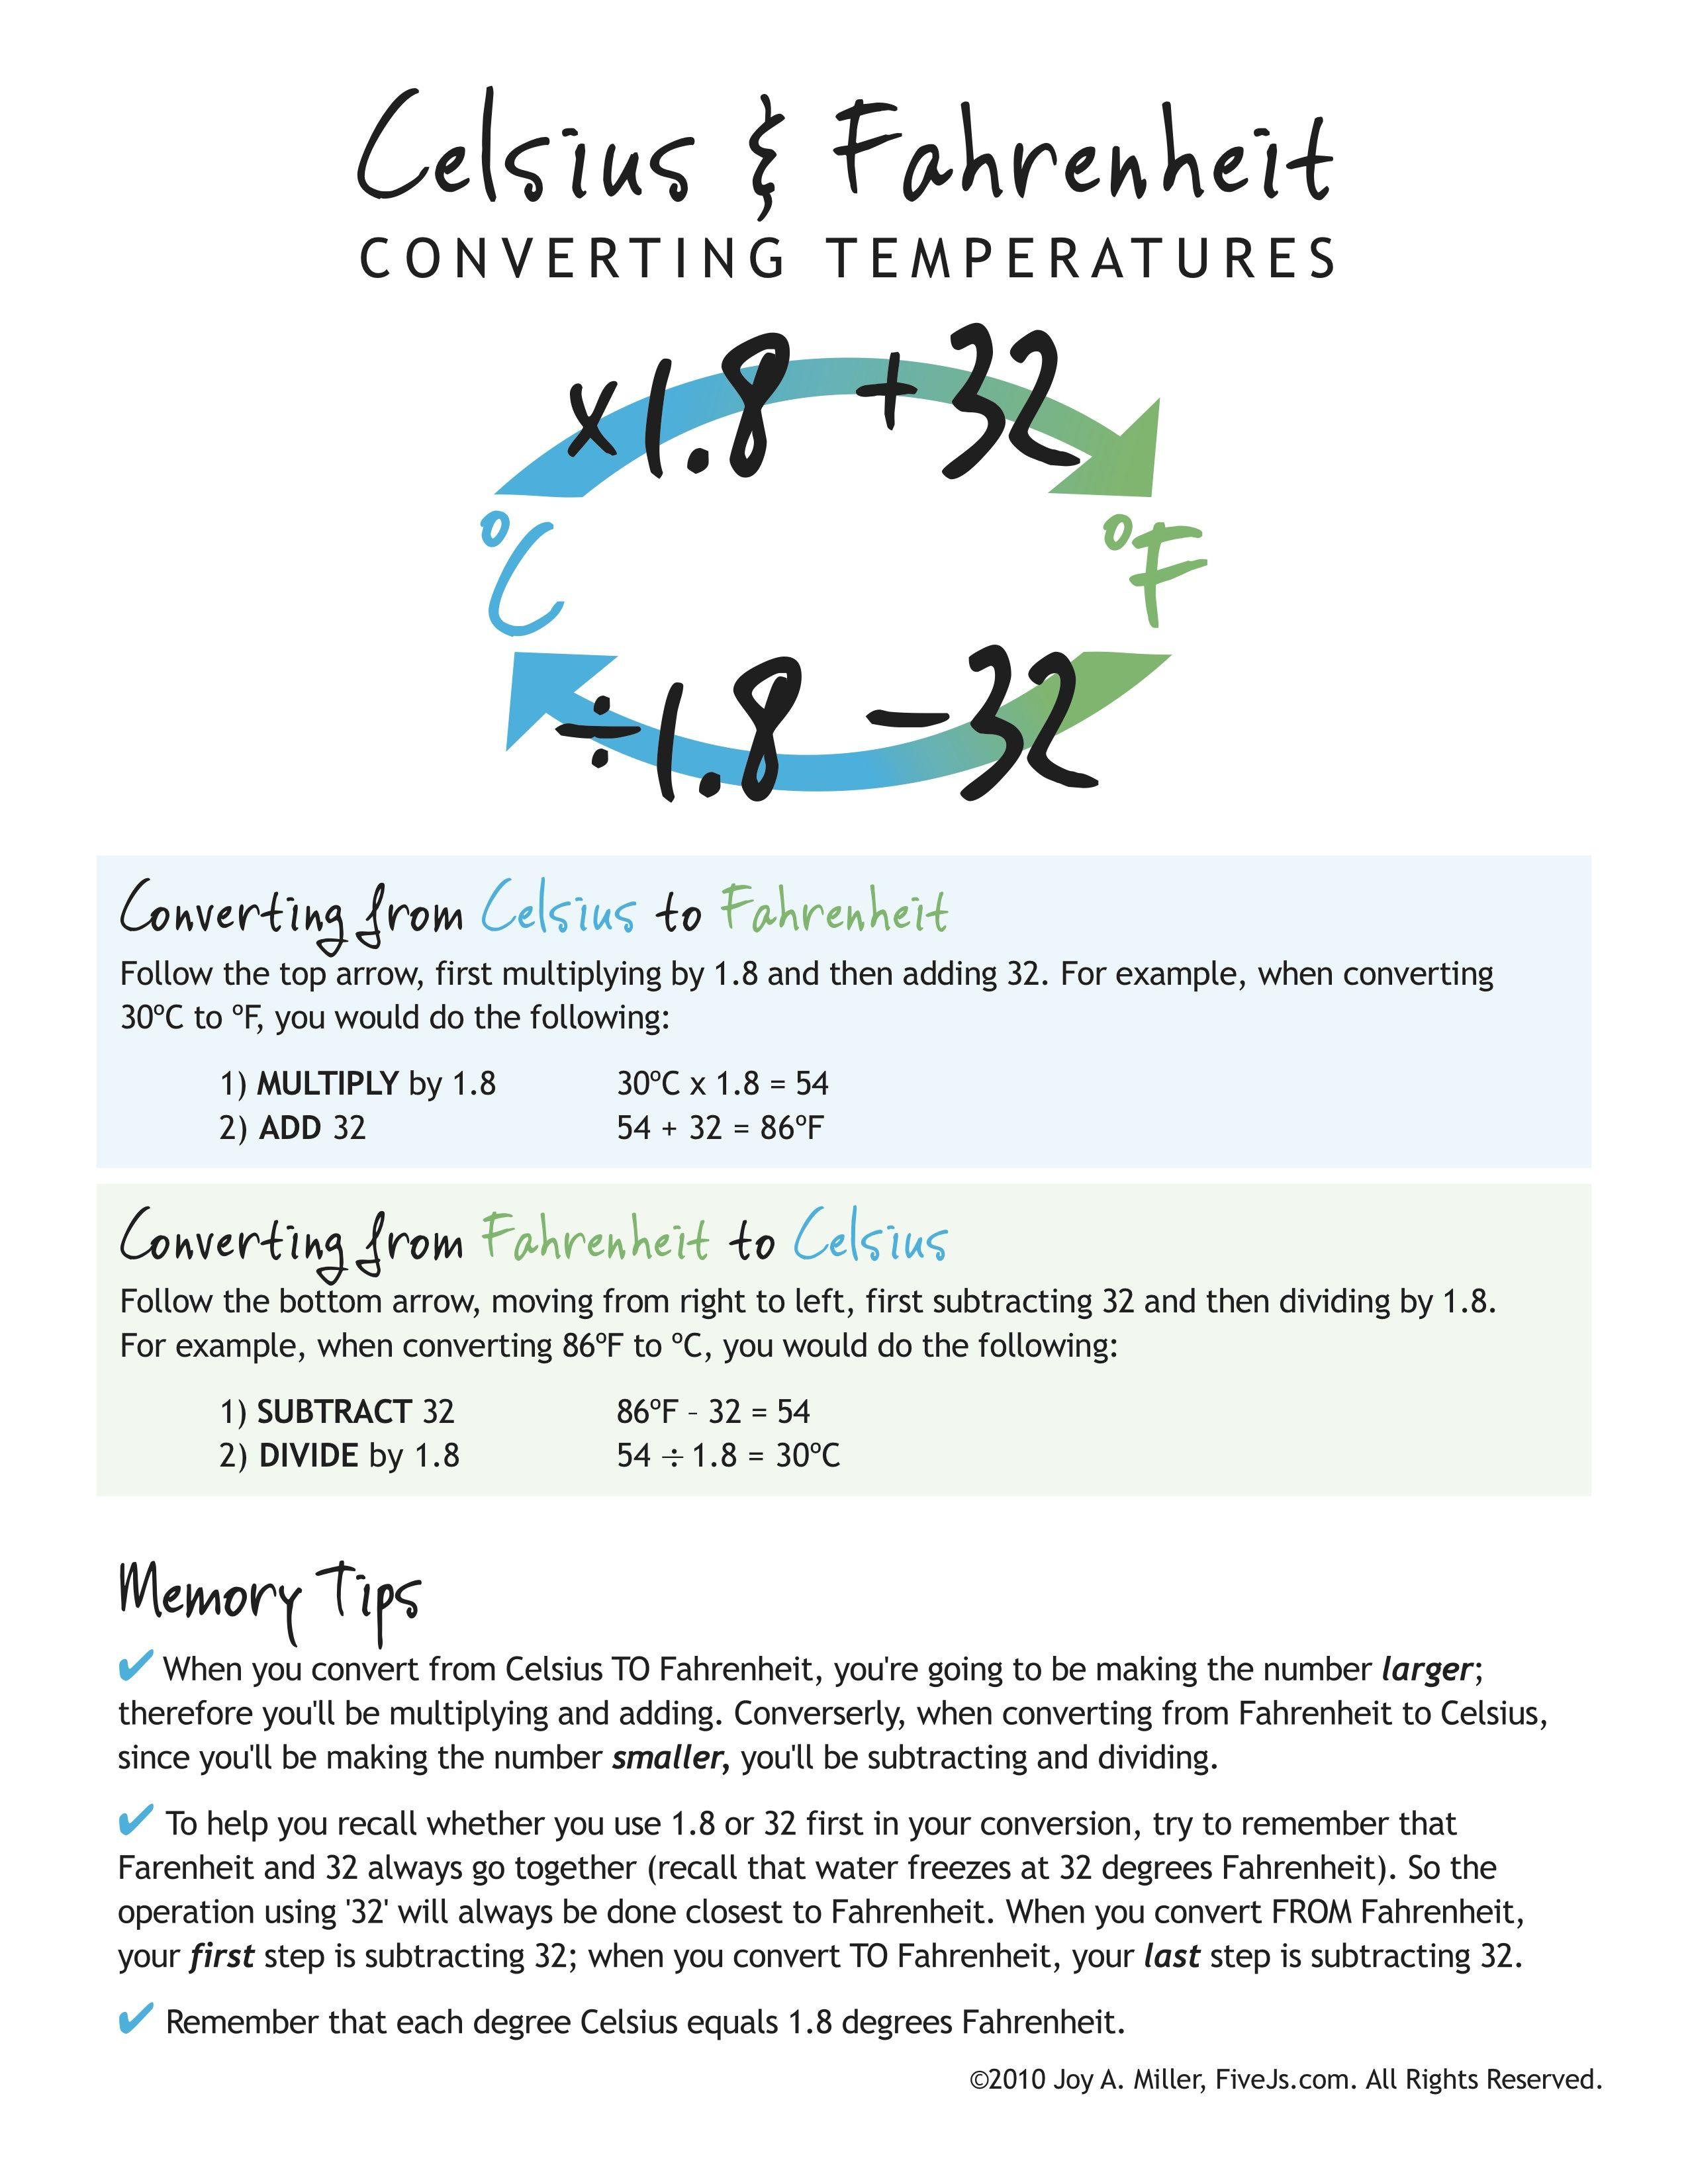 Celsius And Fahrenheit Conversion Chart